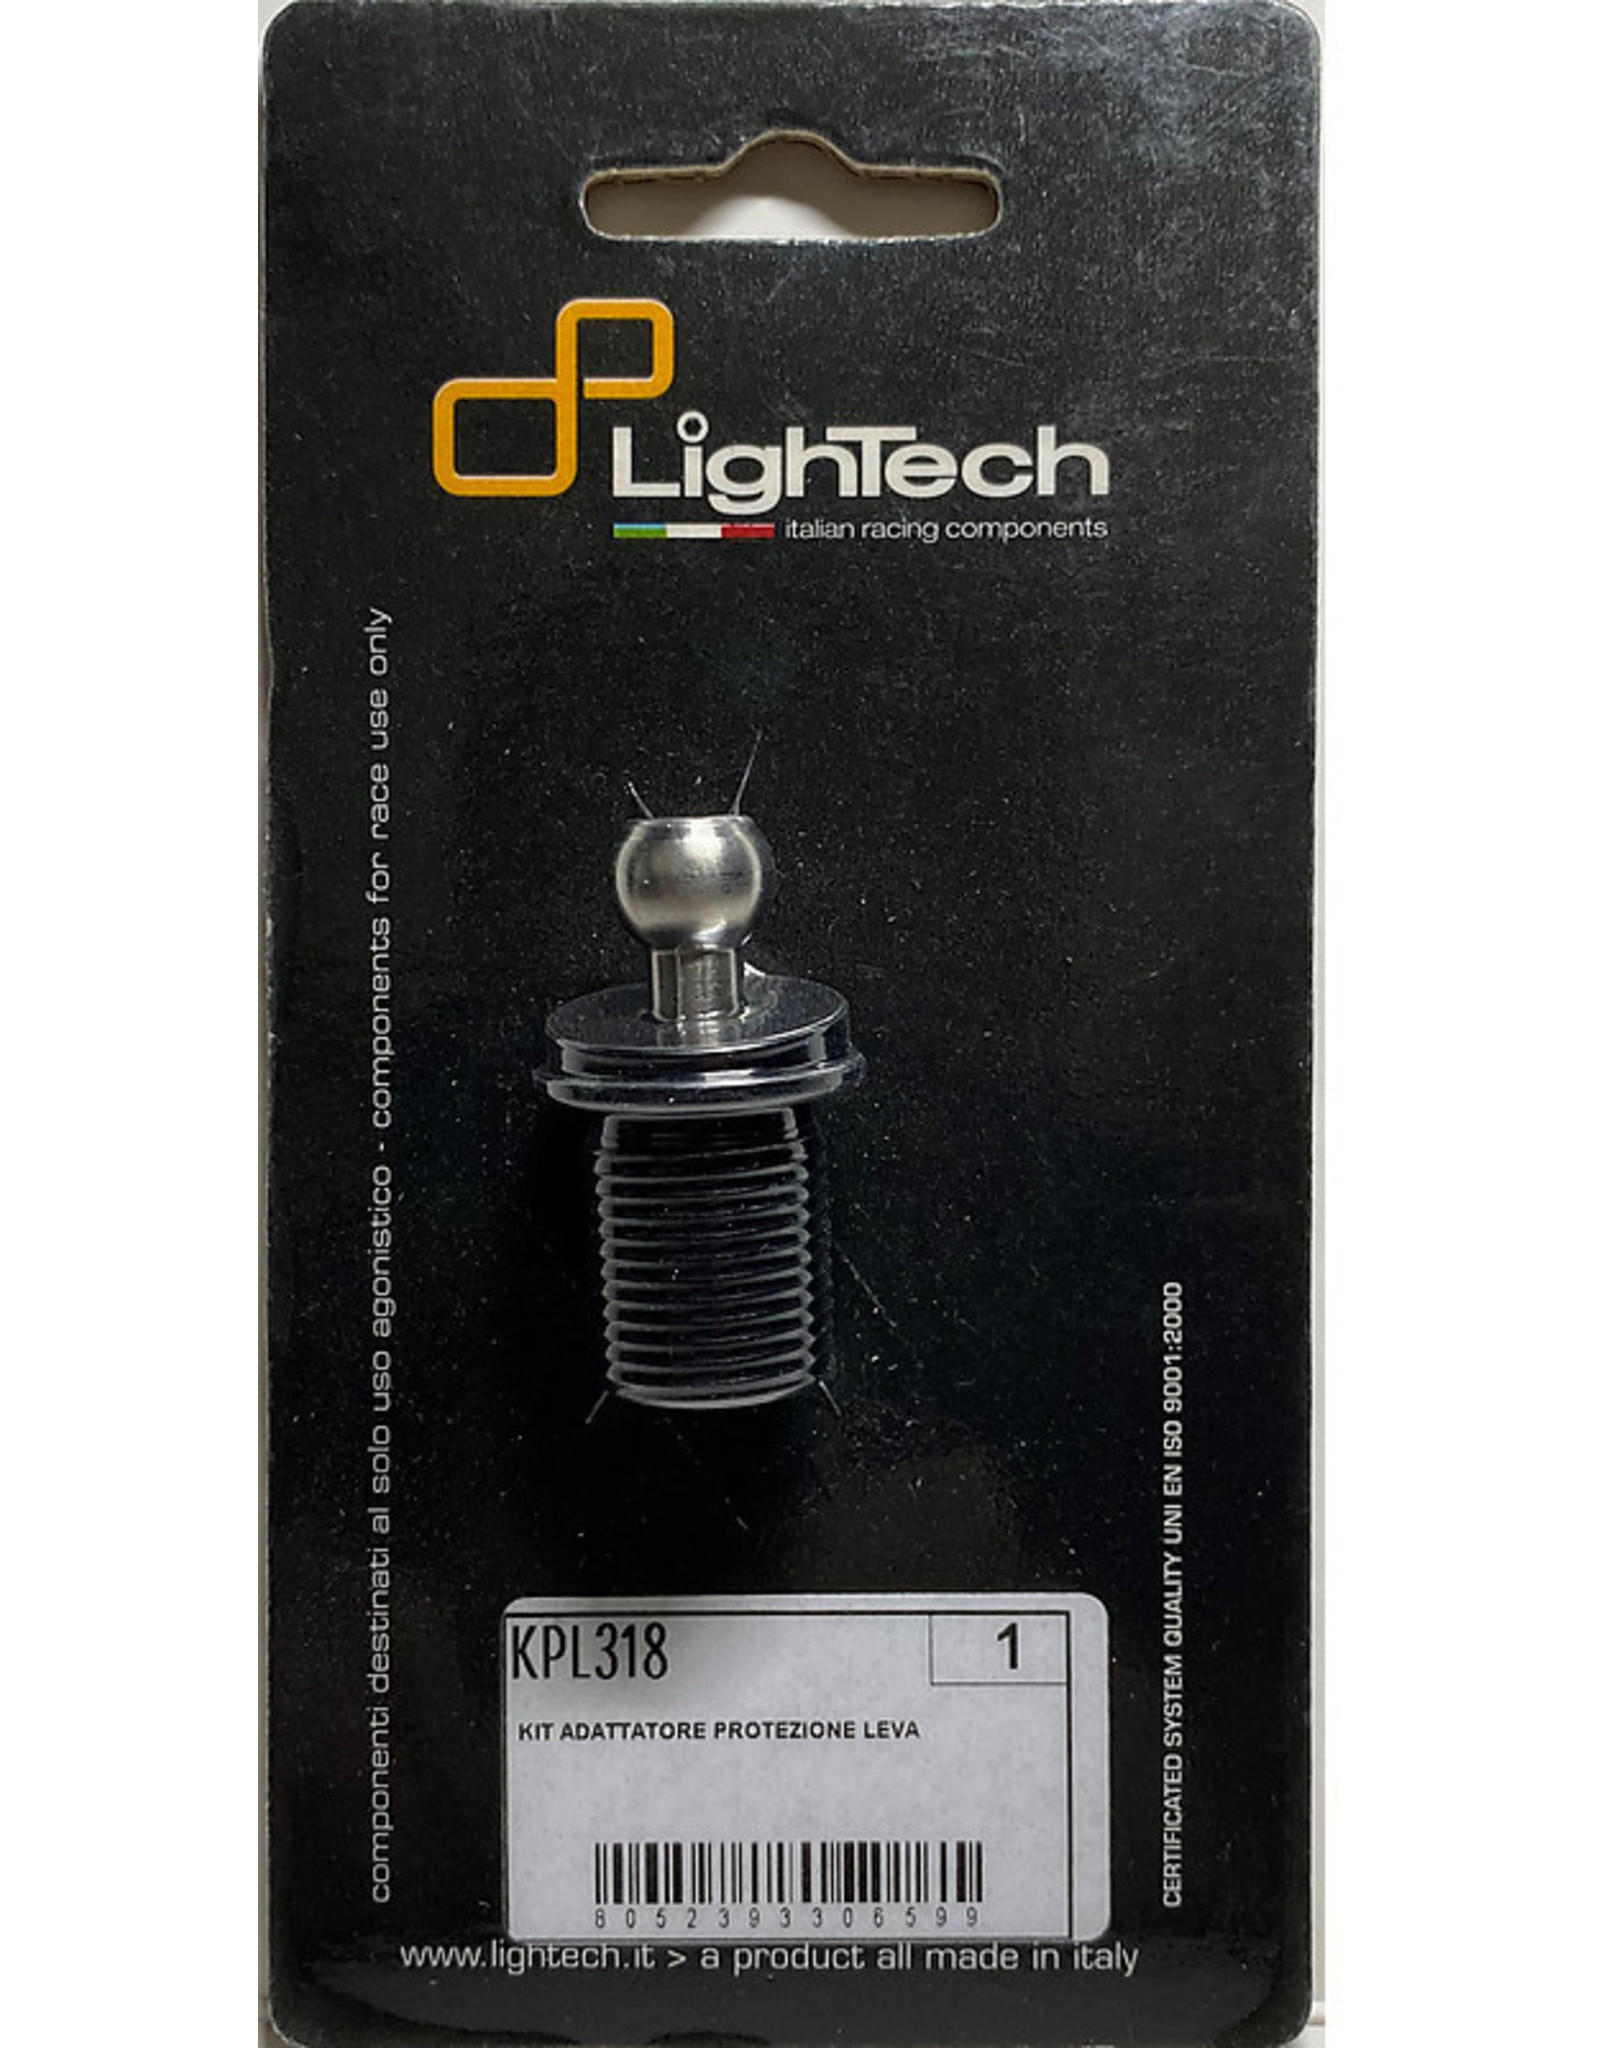 LIGHTECH LIGHTECH DUCATI LEVER PROTECTION FITTING ADAPTOR KPL318